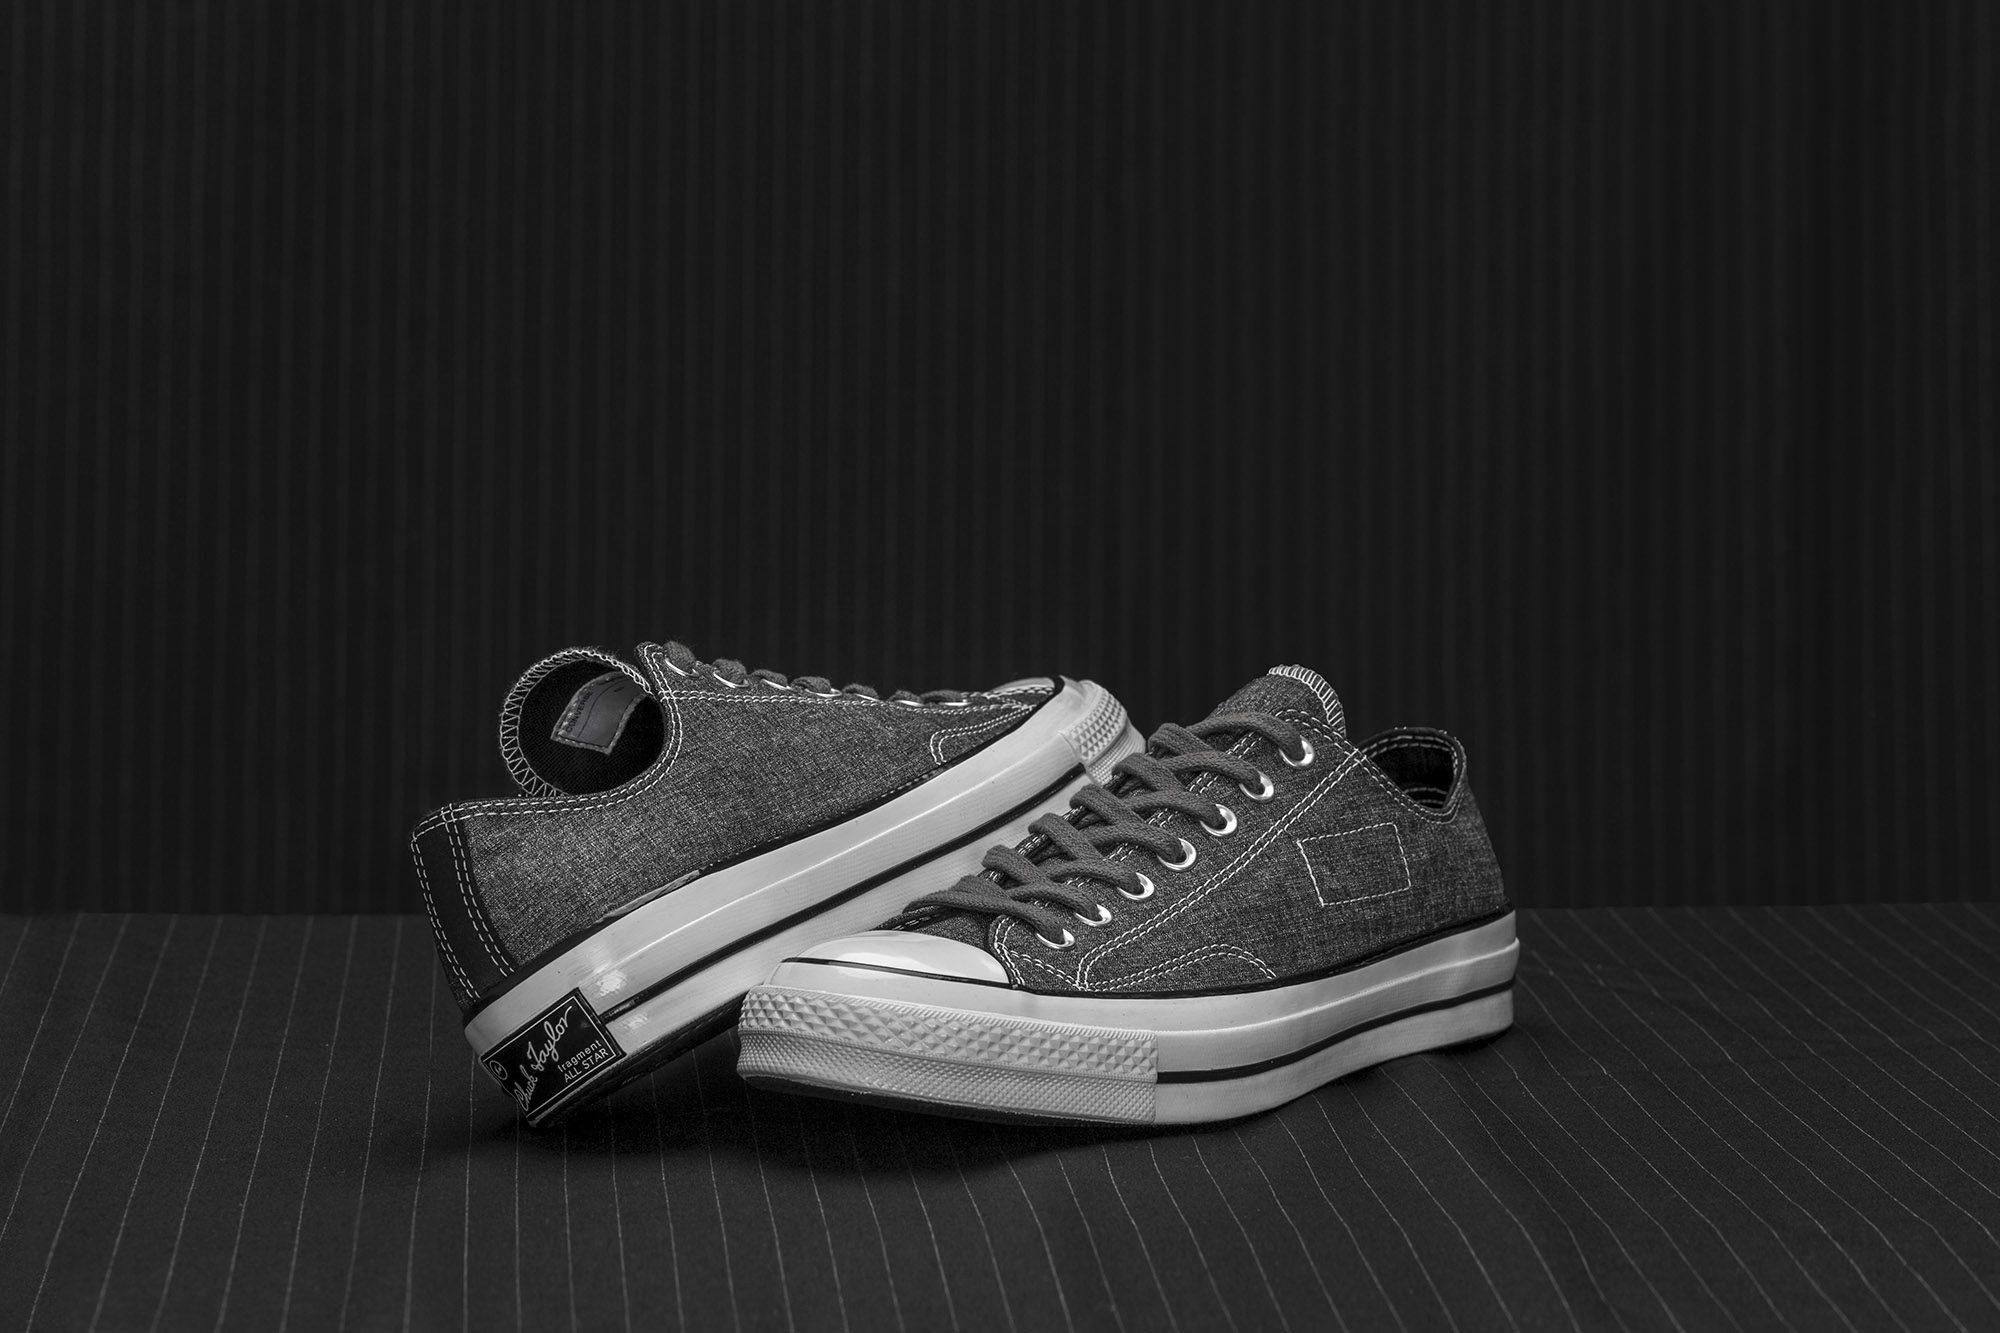 fragment-design-x-converse-chuck-taylor-all-star-70-tuxedo-pack-5